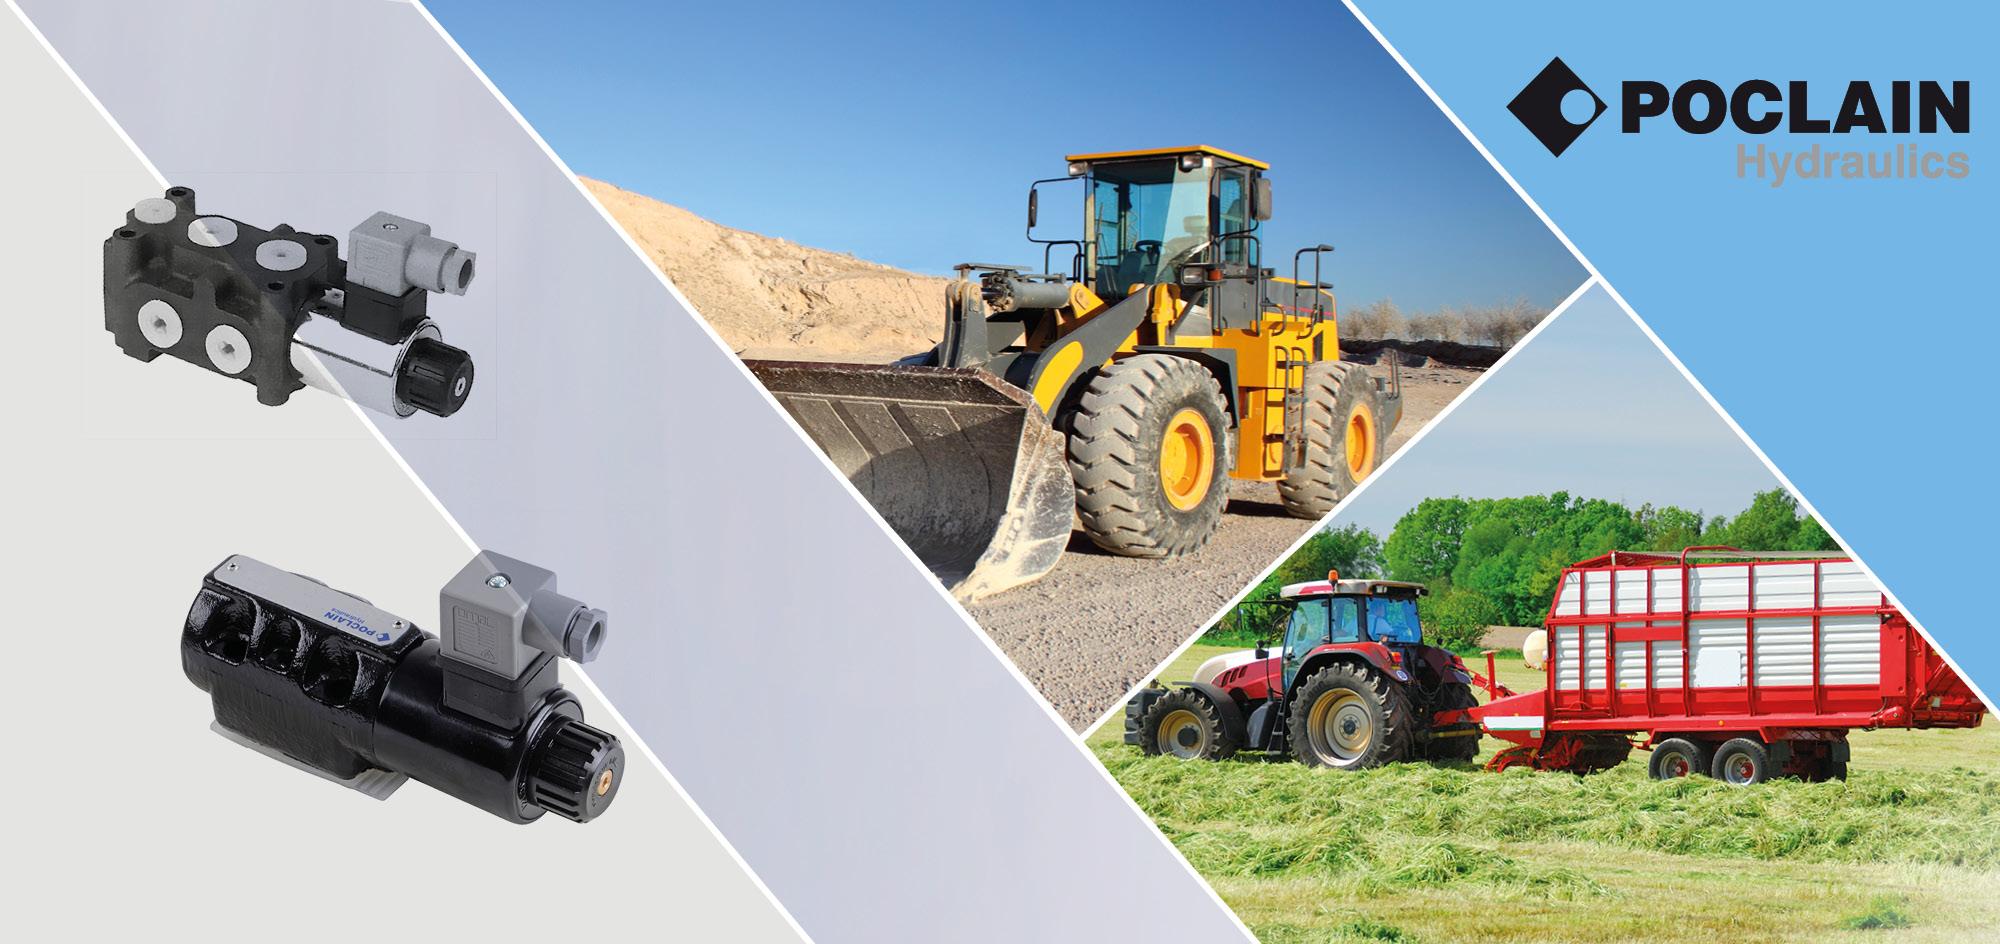 Poclain Hydraulik Radialkolbenmotoren Website Header Template